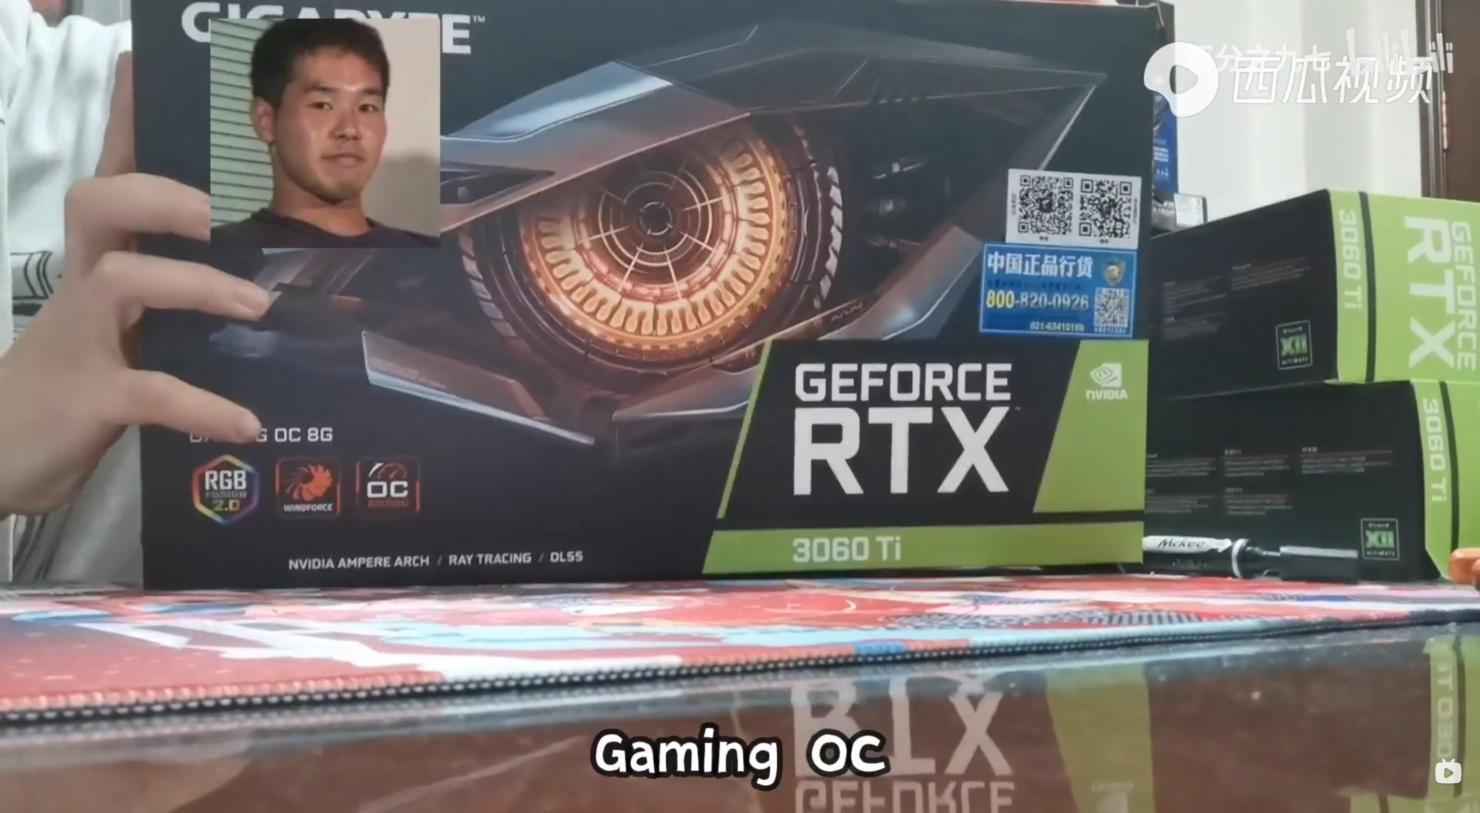 gigabyte-geforce-rtx-3060-ti-gaming-oc-graphics-card_1